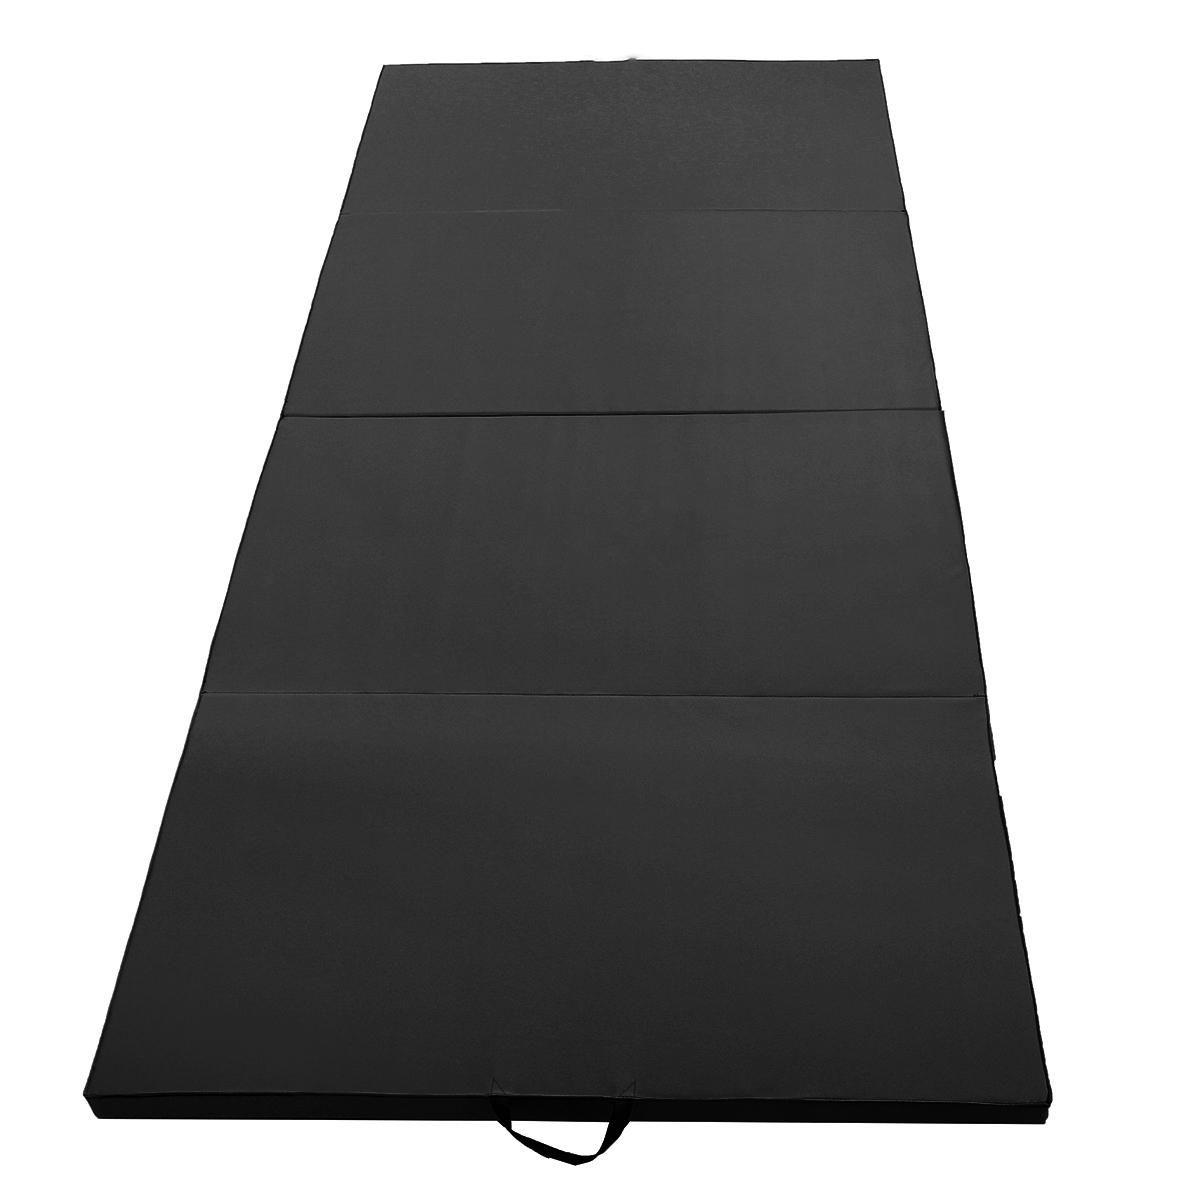 HUK US$208.59 118x47.2x1.97inch Gymnastics Mat Home Gym Folding Panel Sports Yoga Exercise Tumbling Fitness Pad